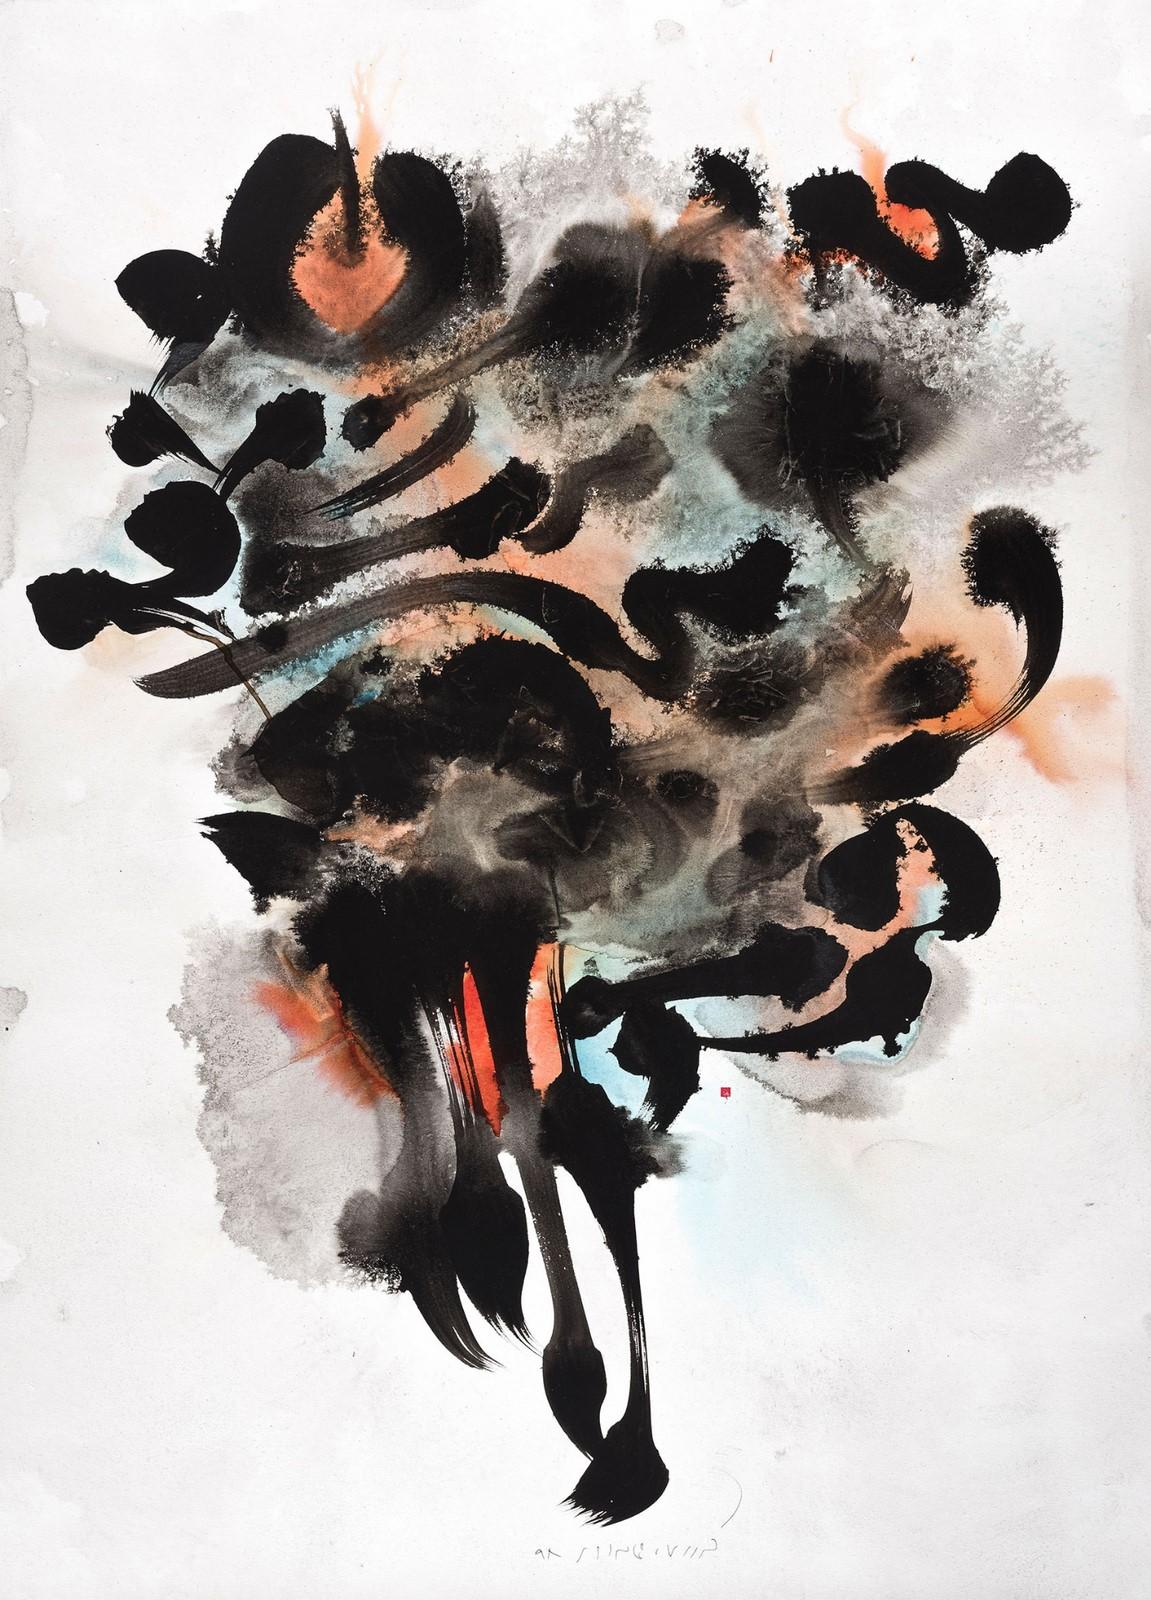 <p>'Pathoglyphics ‐ Kökler ve Ağaçlar Koleksiyonu', Karton Üzerine Mürekkep, 70x100 cm, 2020.<br /><em>'Pathoglyphics ‐ Roots and Trees Collection',Ink on Cardboard, 70x100 cm, 2020.</em></p><p></p>